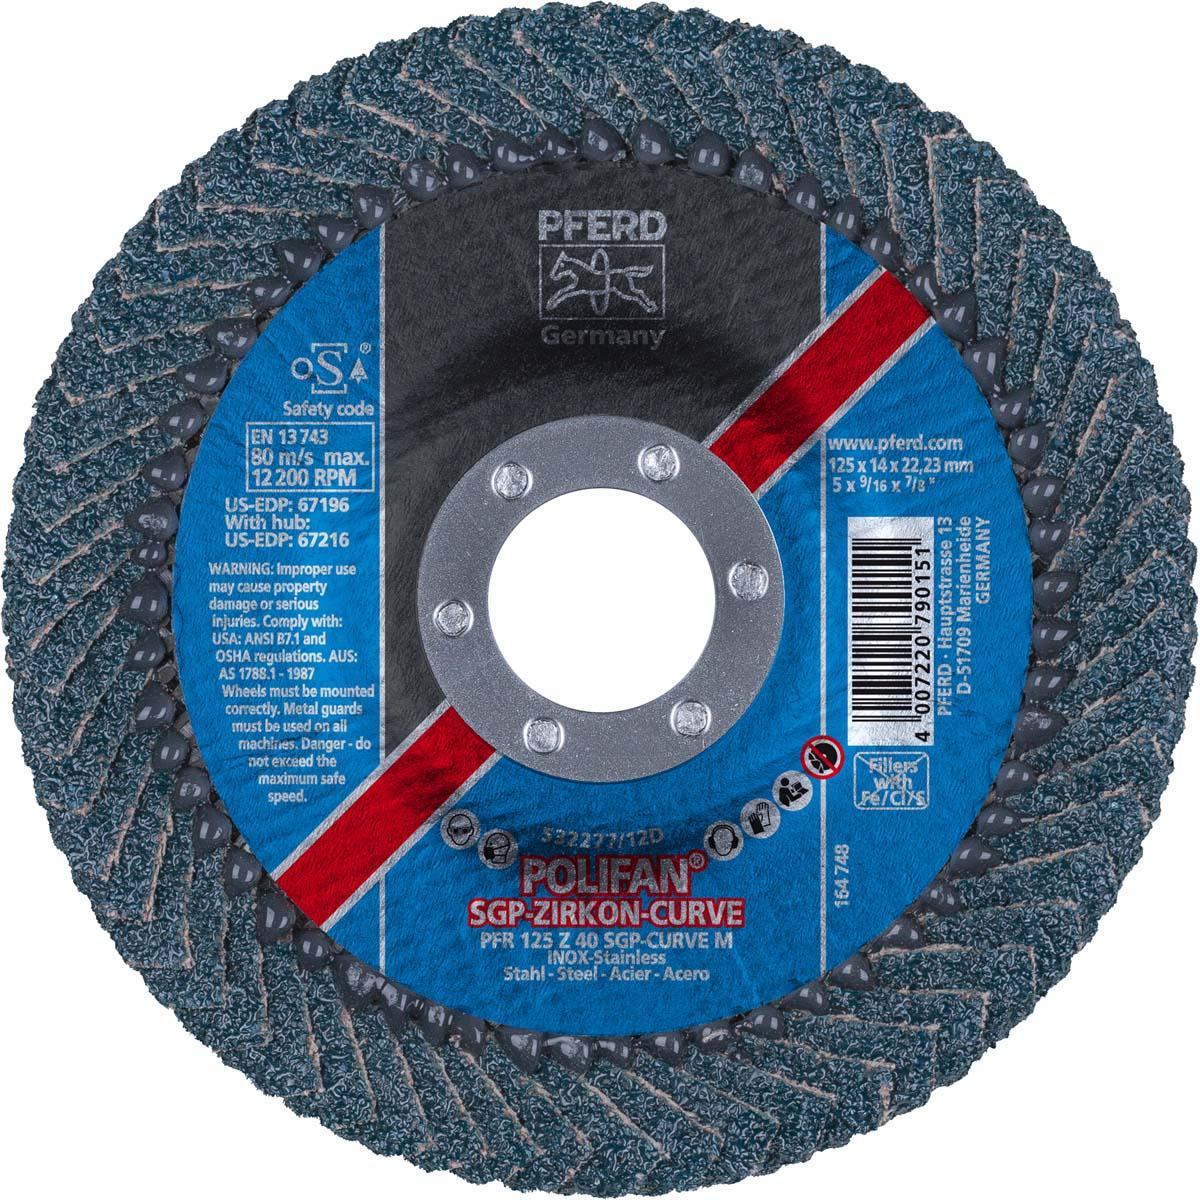 "5"" x 7/8"" POLIFAN® CURVE Flap Disc SGP, Zirconia, 40 Grit, Medium Radius"